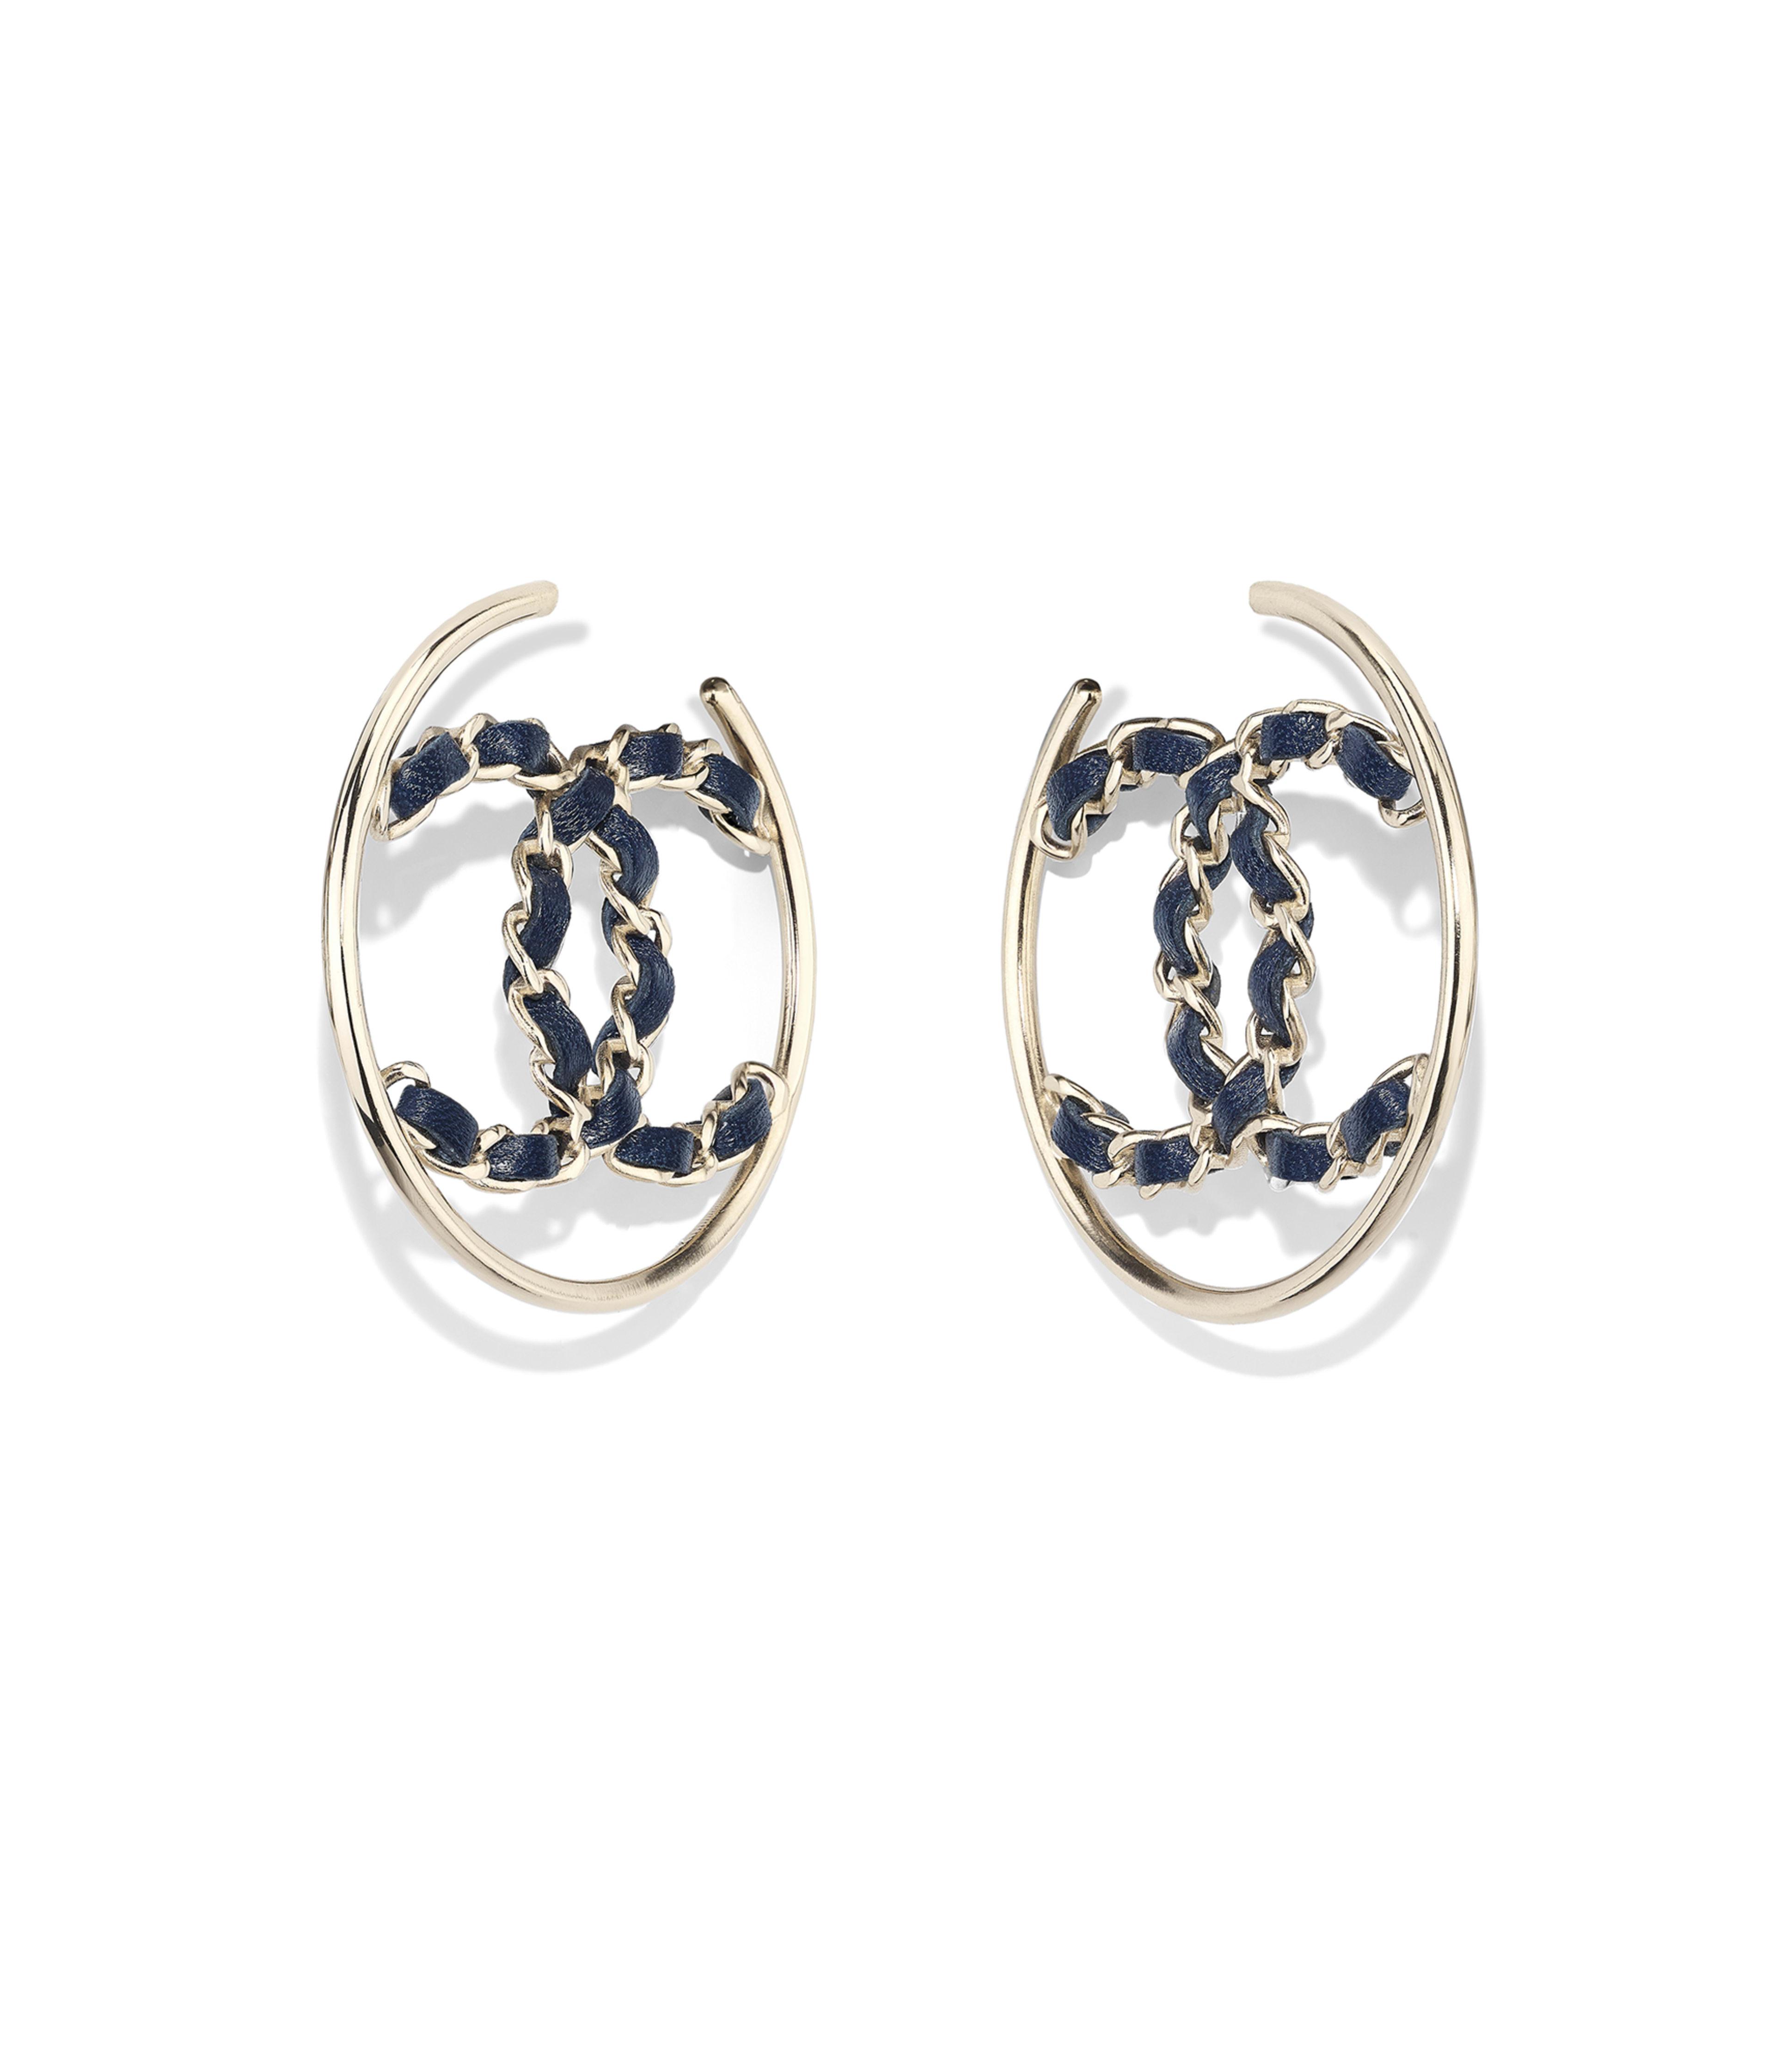 Earrings Metal Calfskin Gold Blue Ref Ab0565y47598z9041